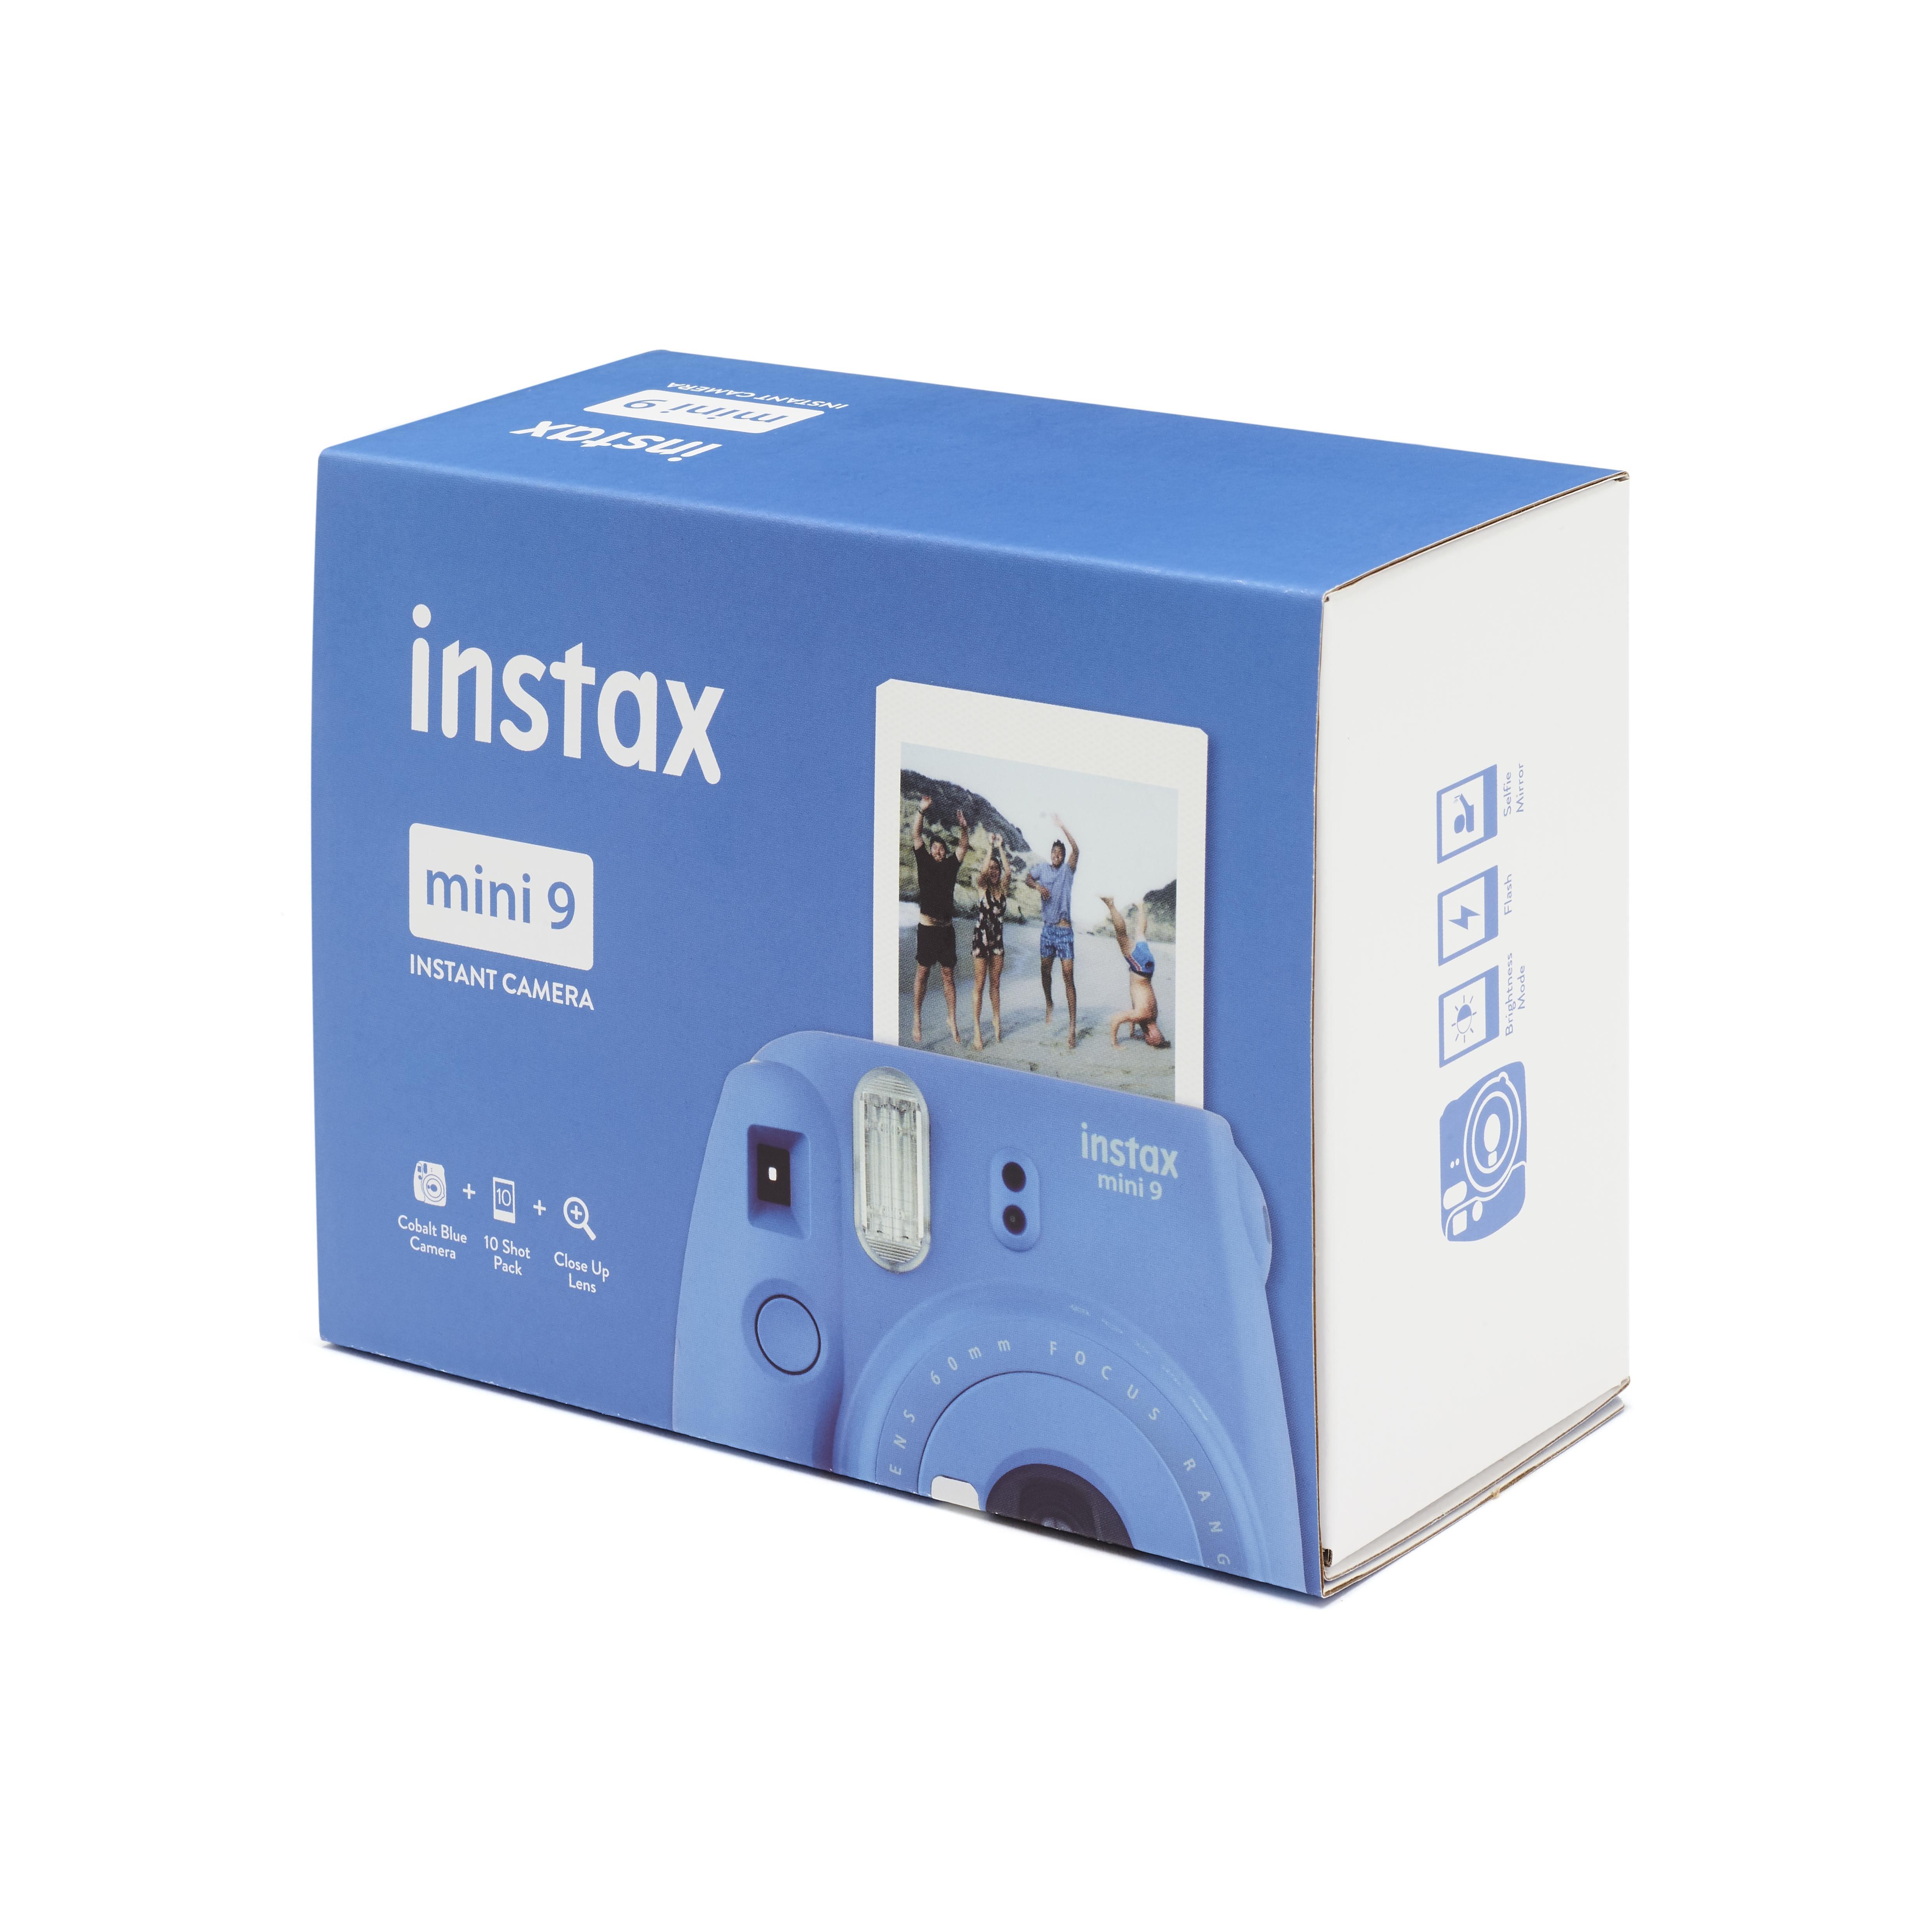 polaroid instax mini 9 ricariche  Fujifilm Instax Mini 9 - kit pellicola   Hobbyfoto